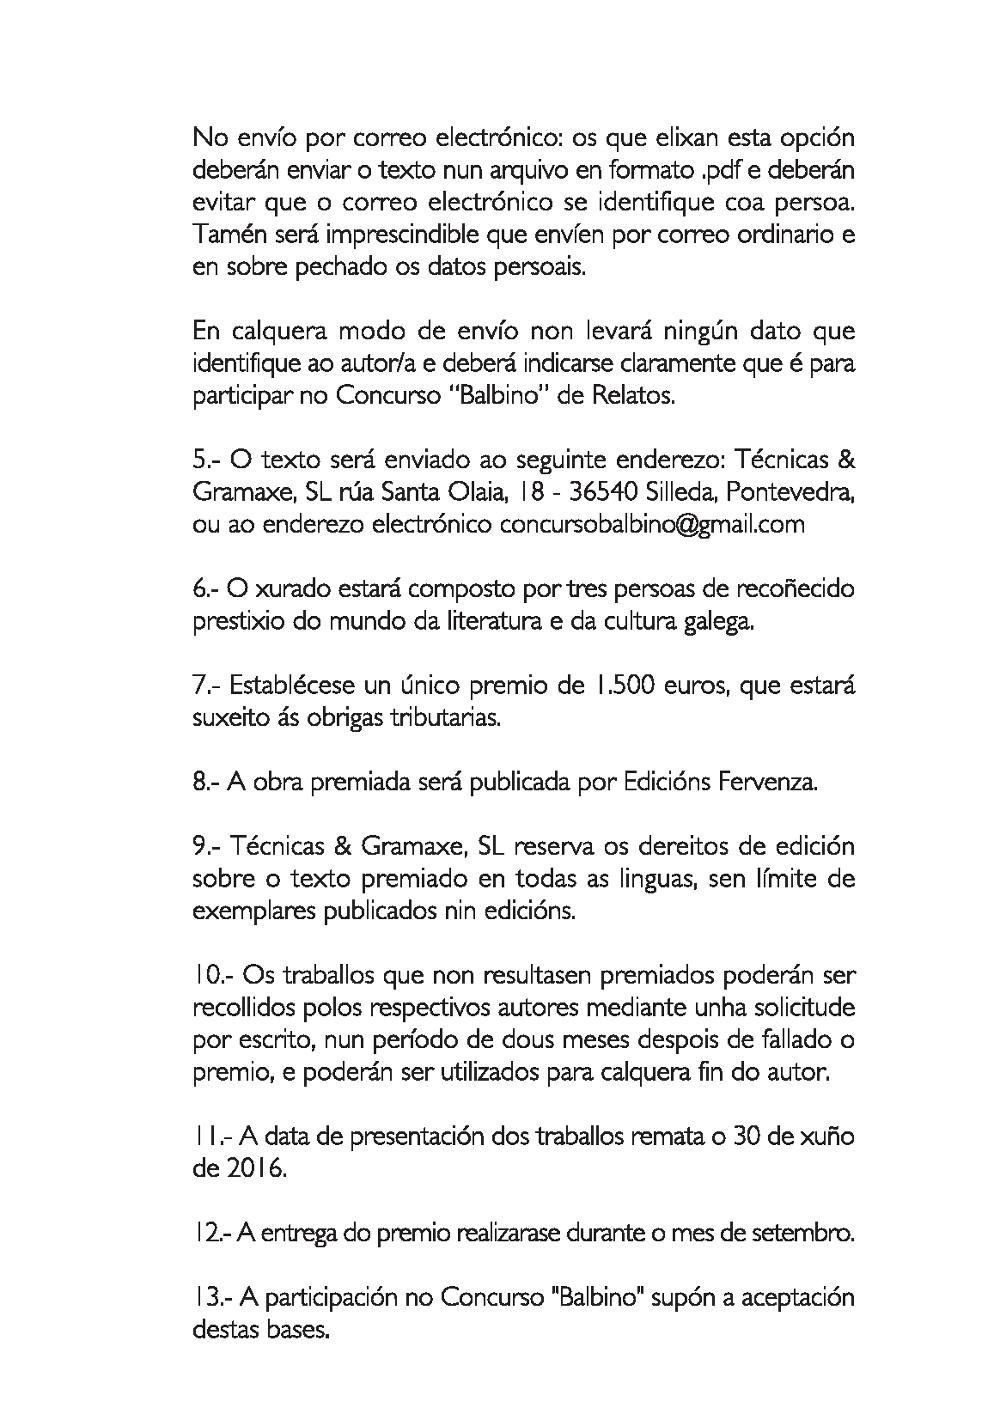 Concurso Balbino 2016 3